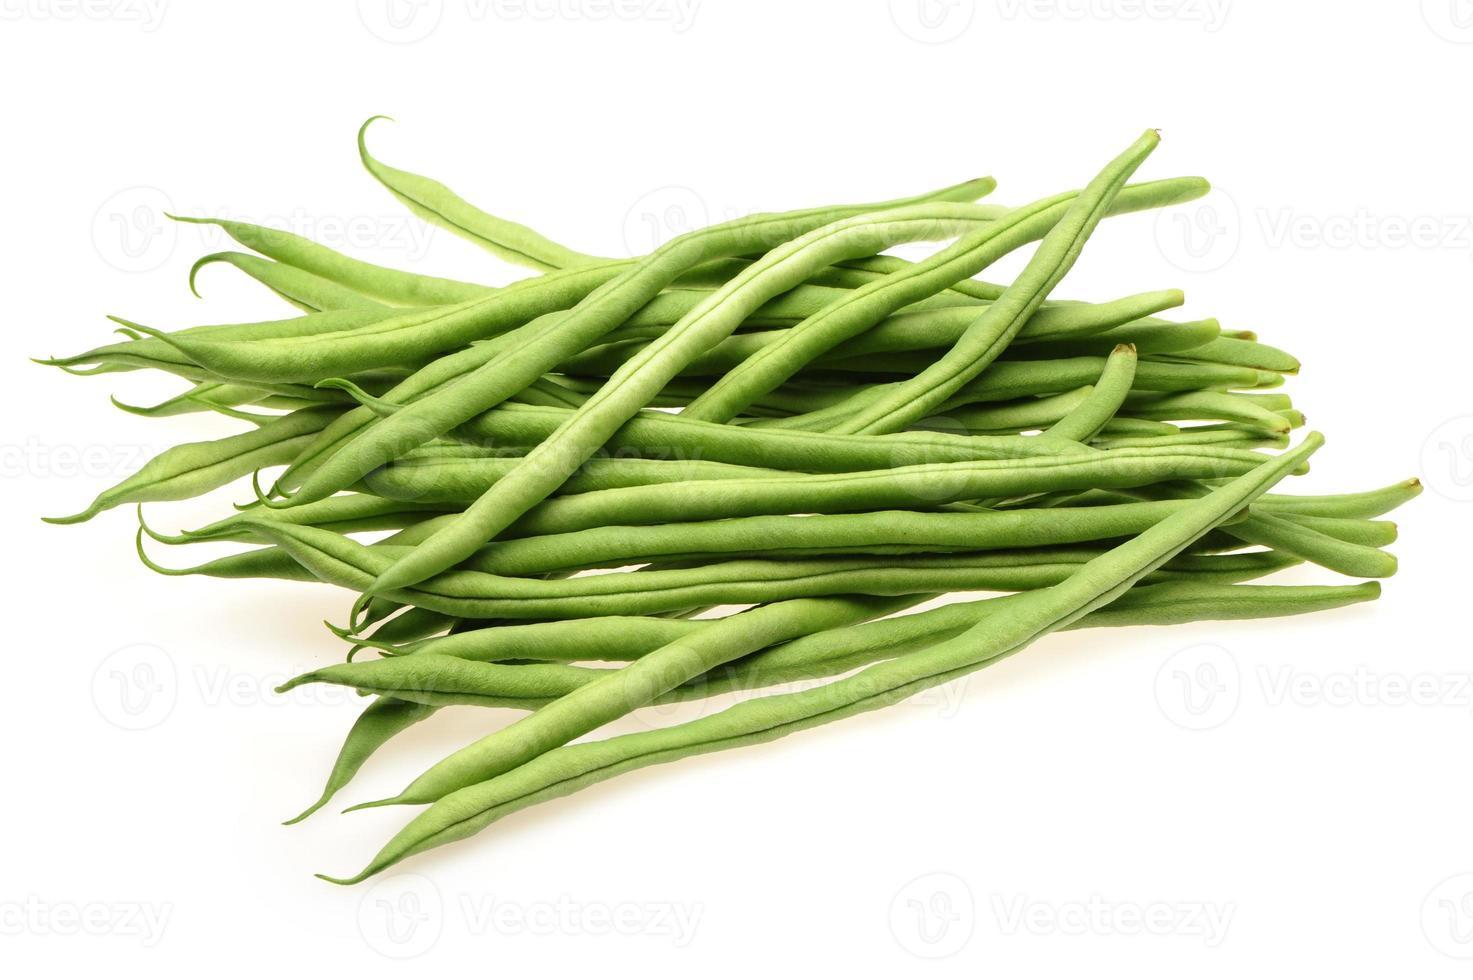 Green kidney bean photo